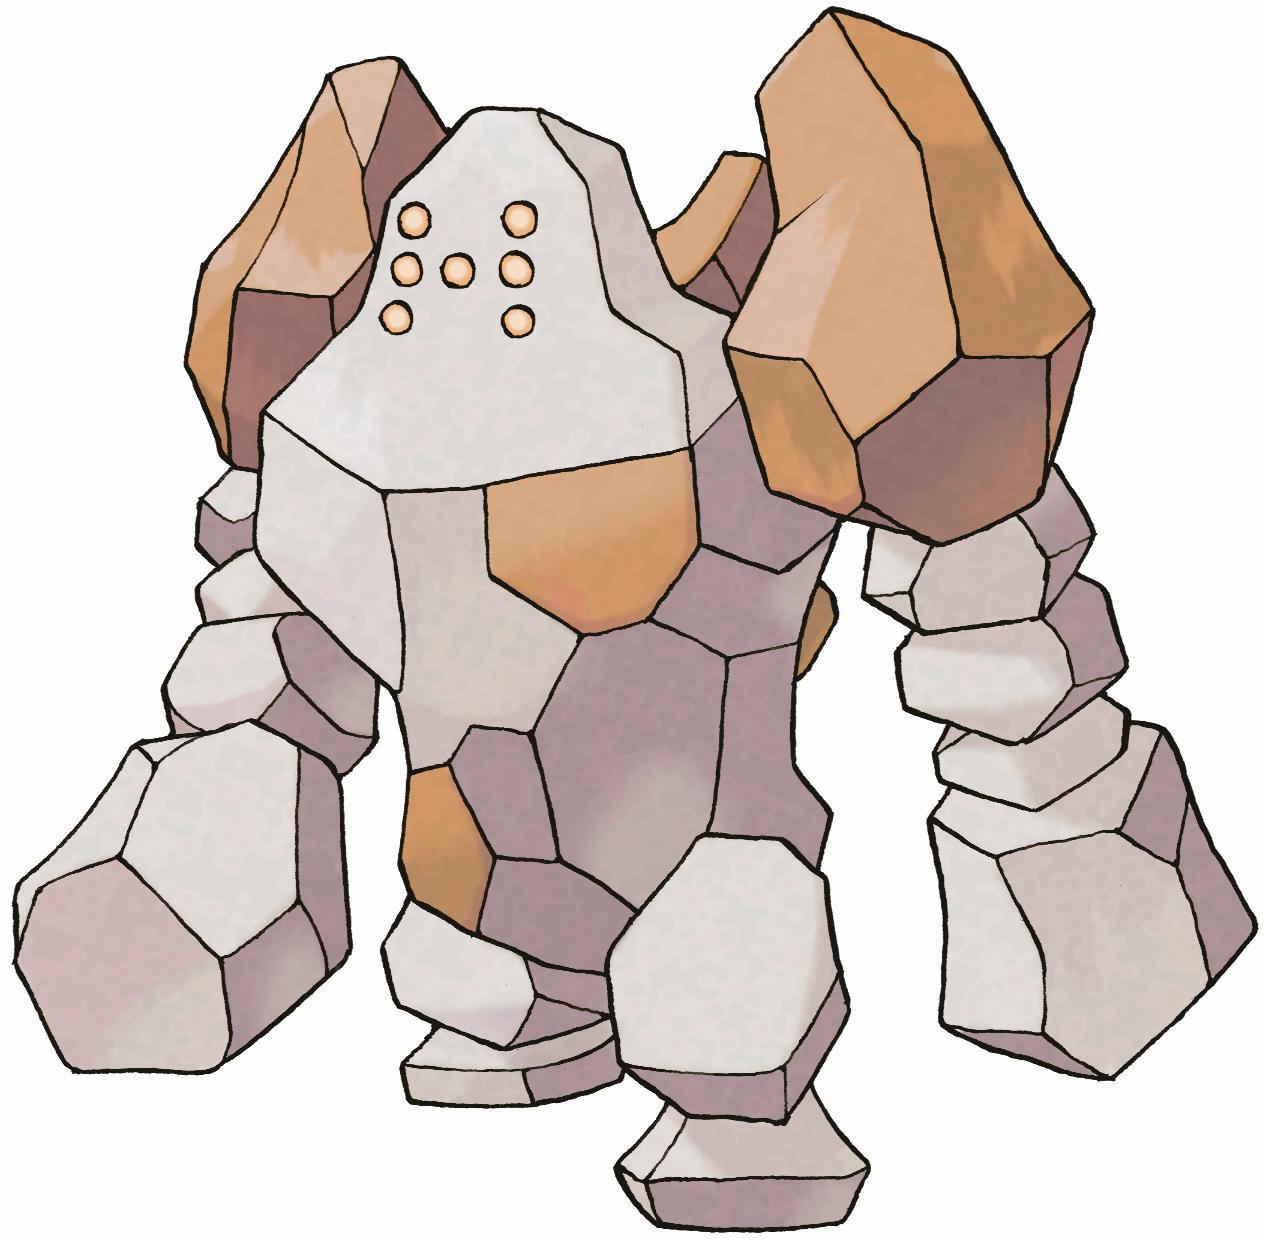 Banque Pokémon - Le trio légendaire Regirock, Regice et Registeel offert ! 377_re10